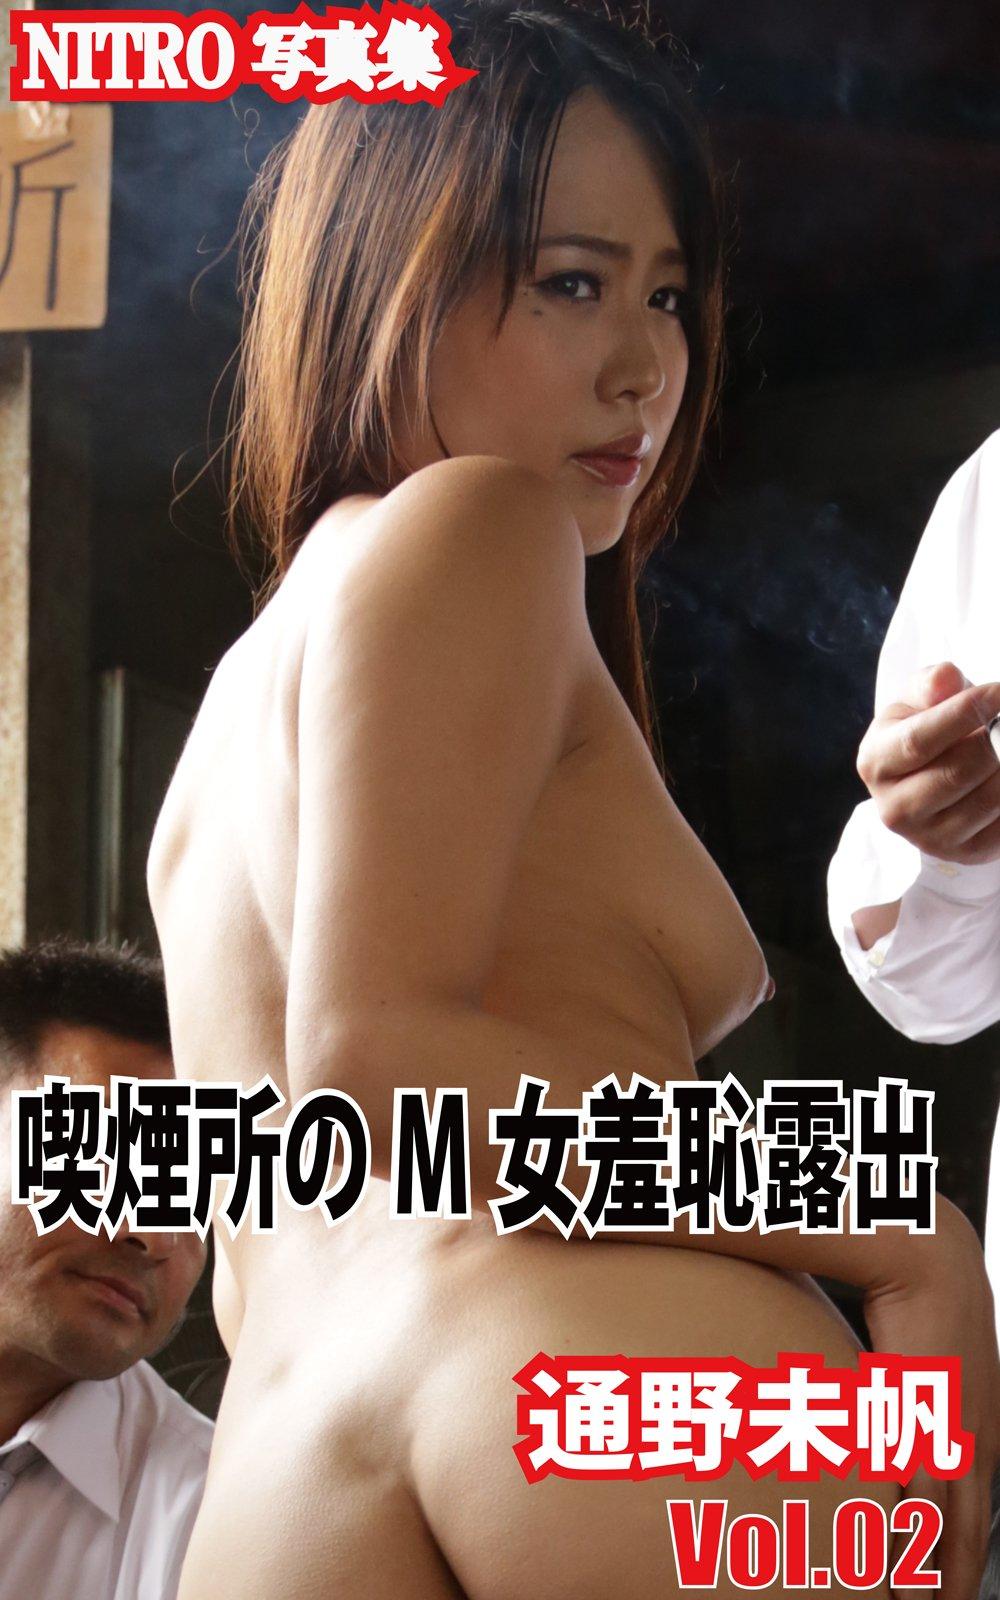 Nitorosyashinnsyusyuchishinnrosyututoonomihoborusann (Japanese Edition)